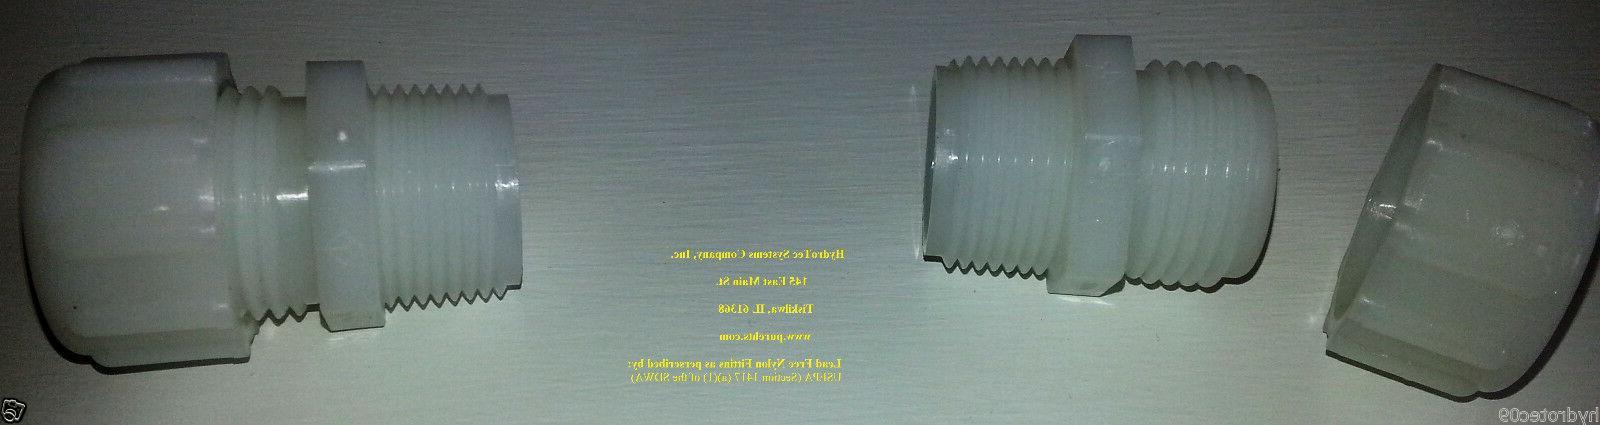 Mobile-Soft-Water 12,800 Manual Softener w/salt RV-Boat&Cabin